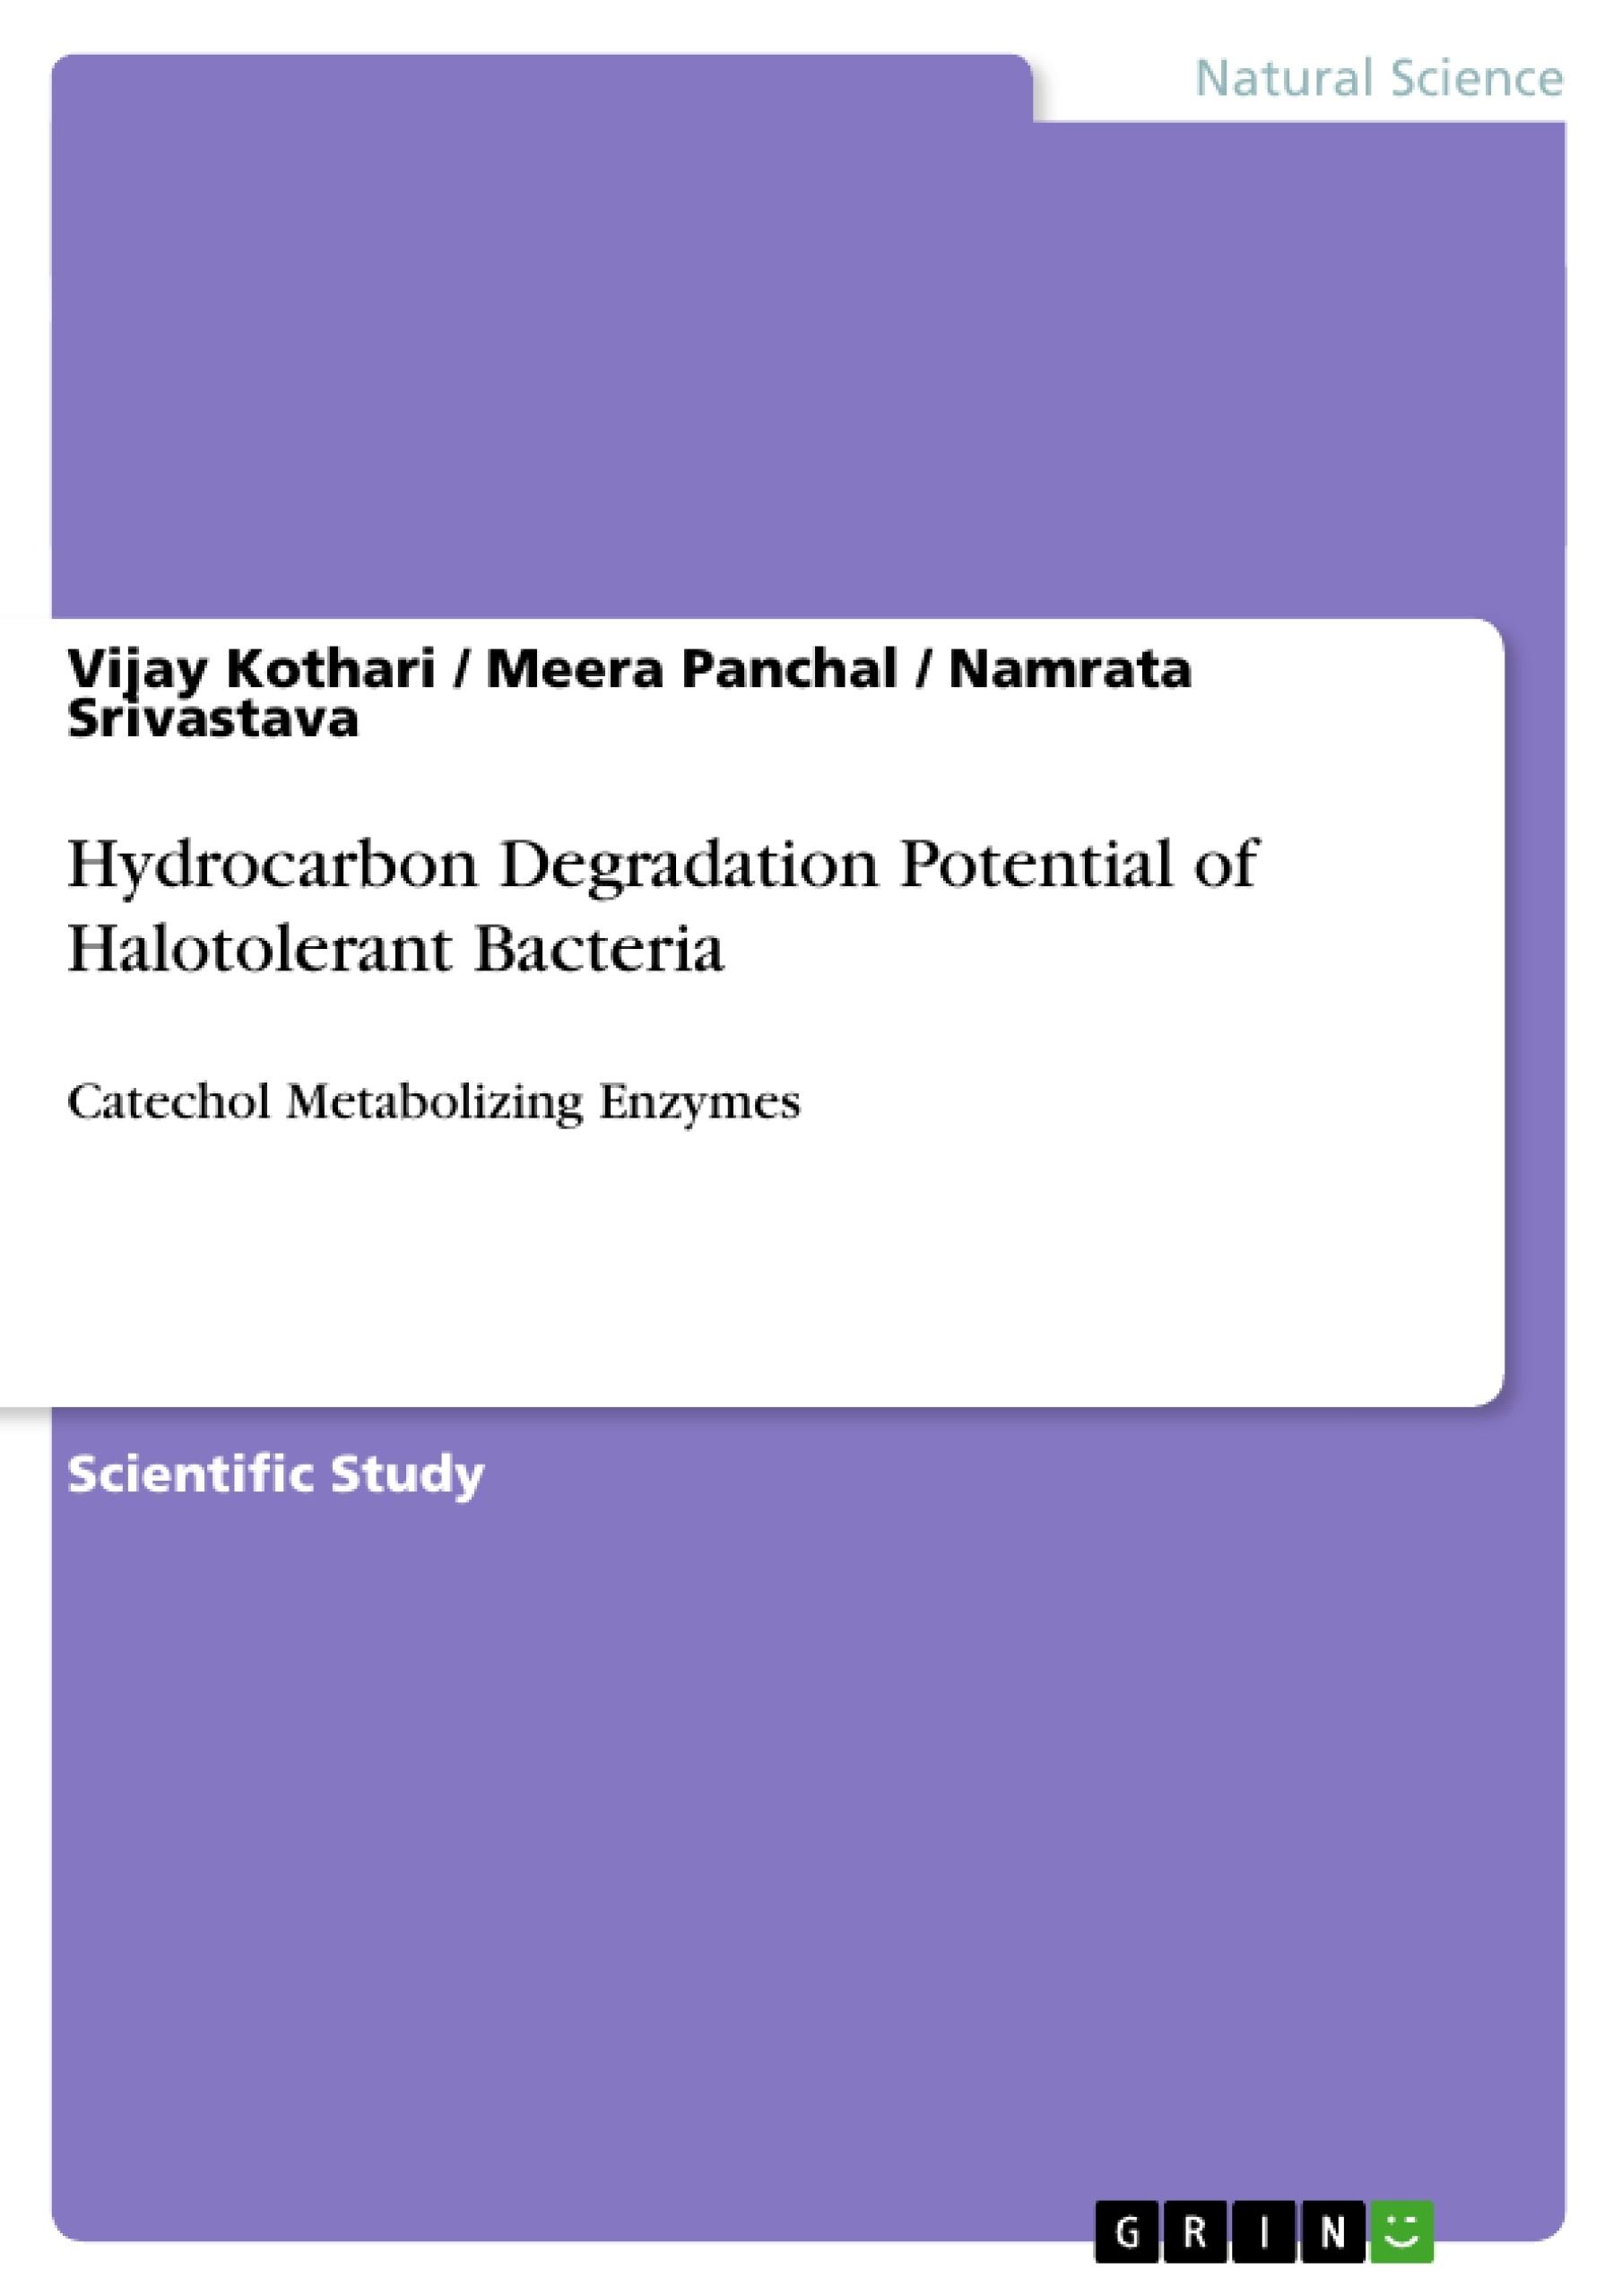 Title: Hydrocarbon Degradation Potential of Halotolerant Bacteria